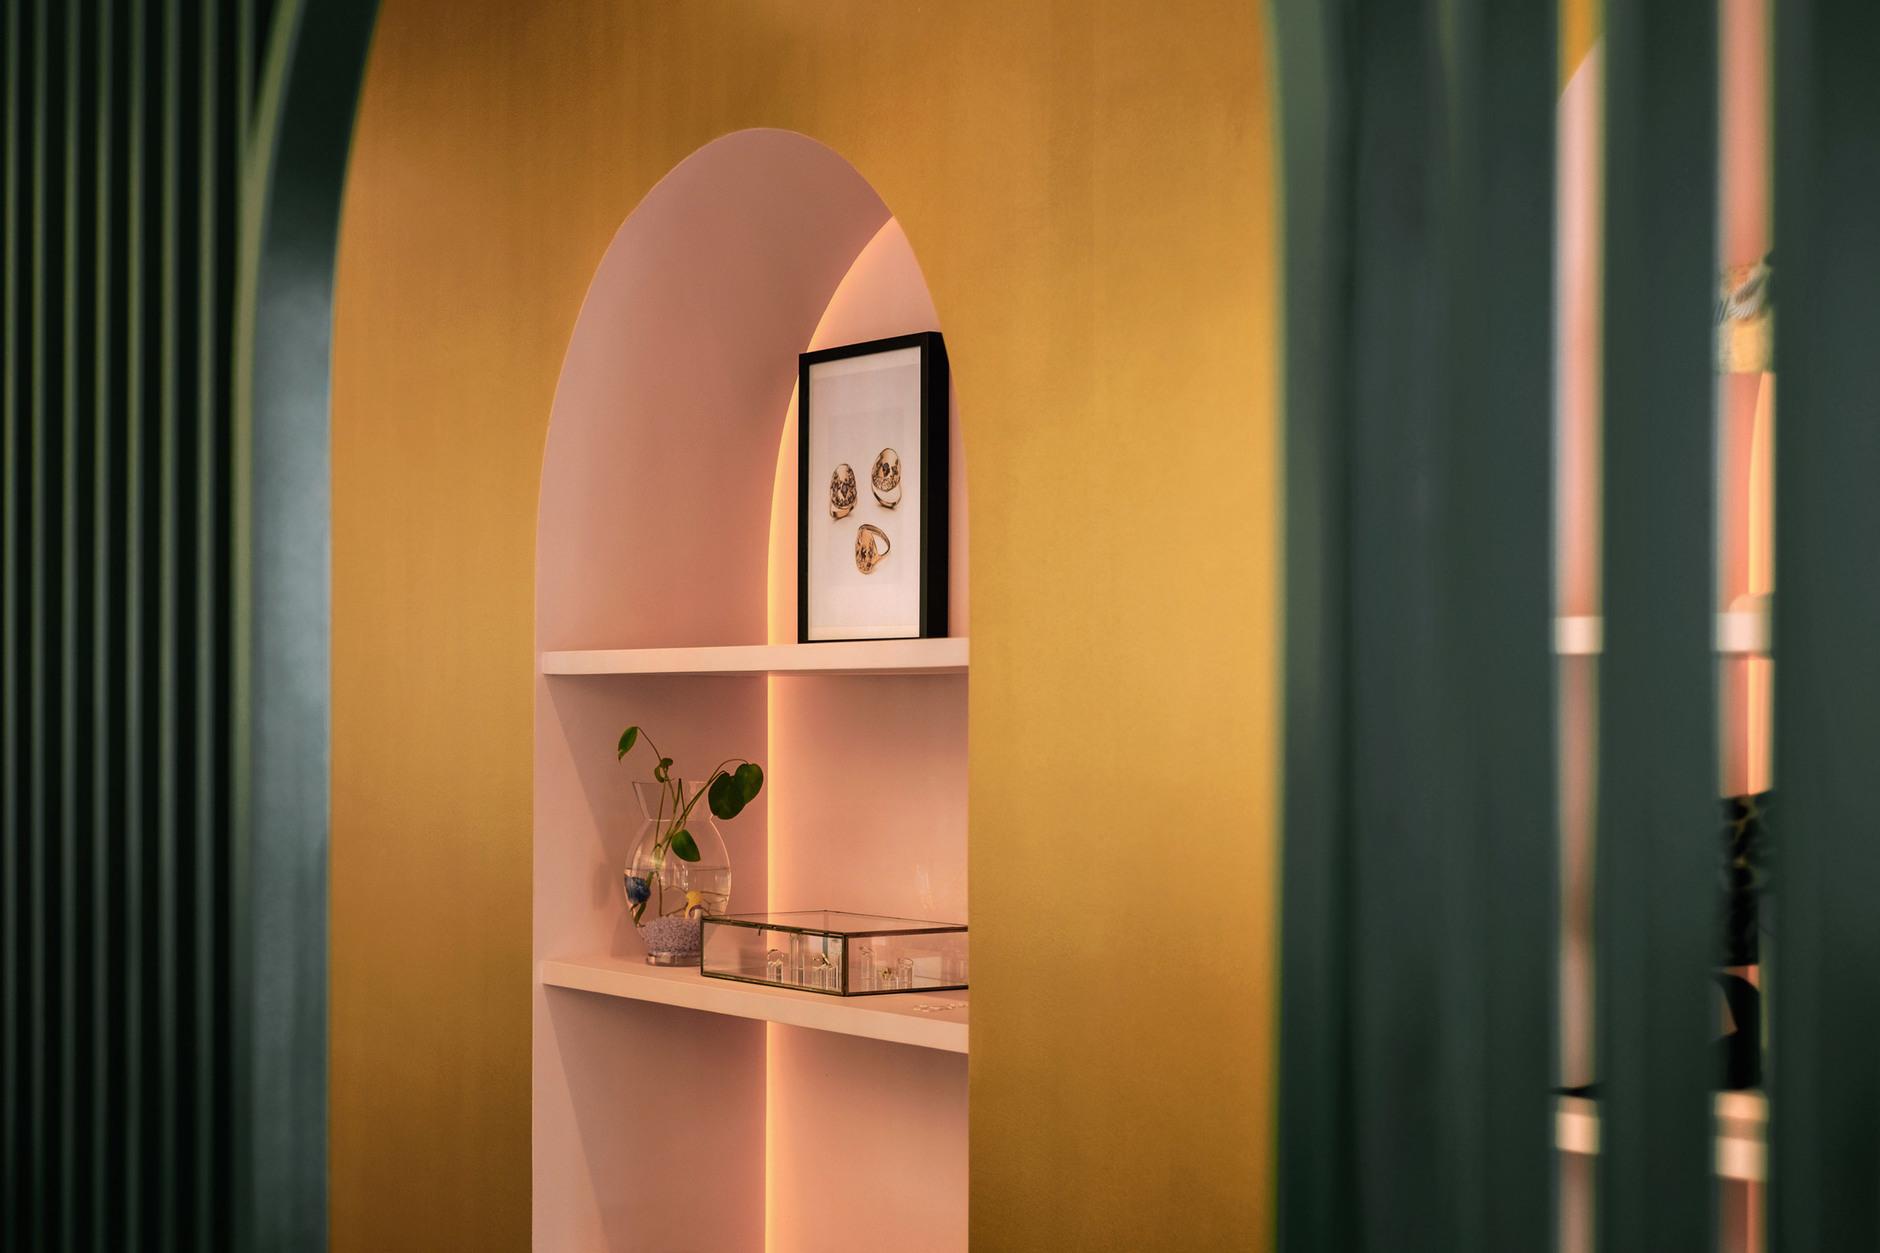 Яркий проект Pastel Rita в Монреале от студии Appareil Architecture (галерея 5, фото 2)